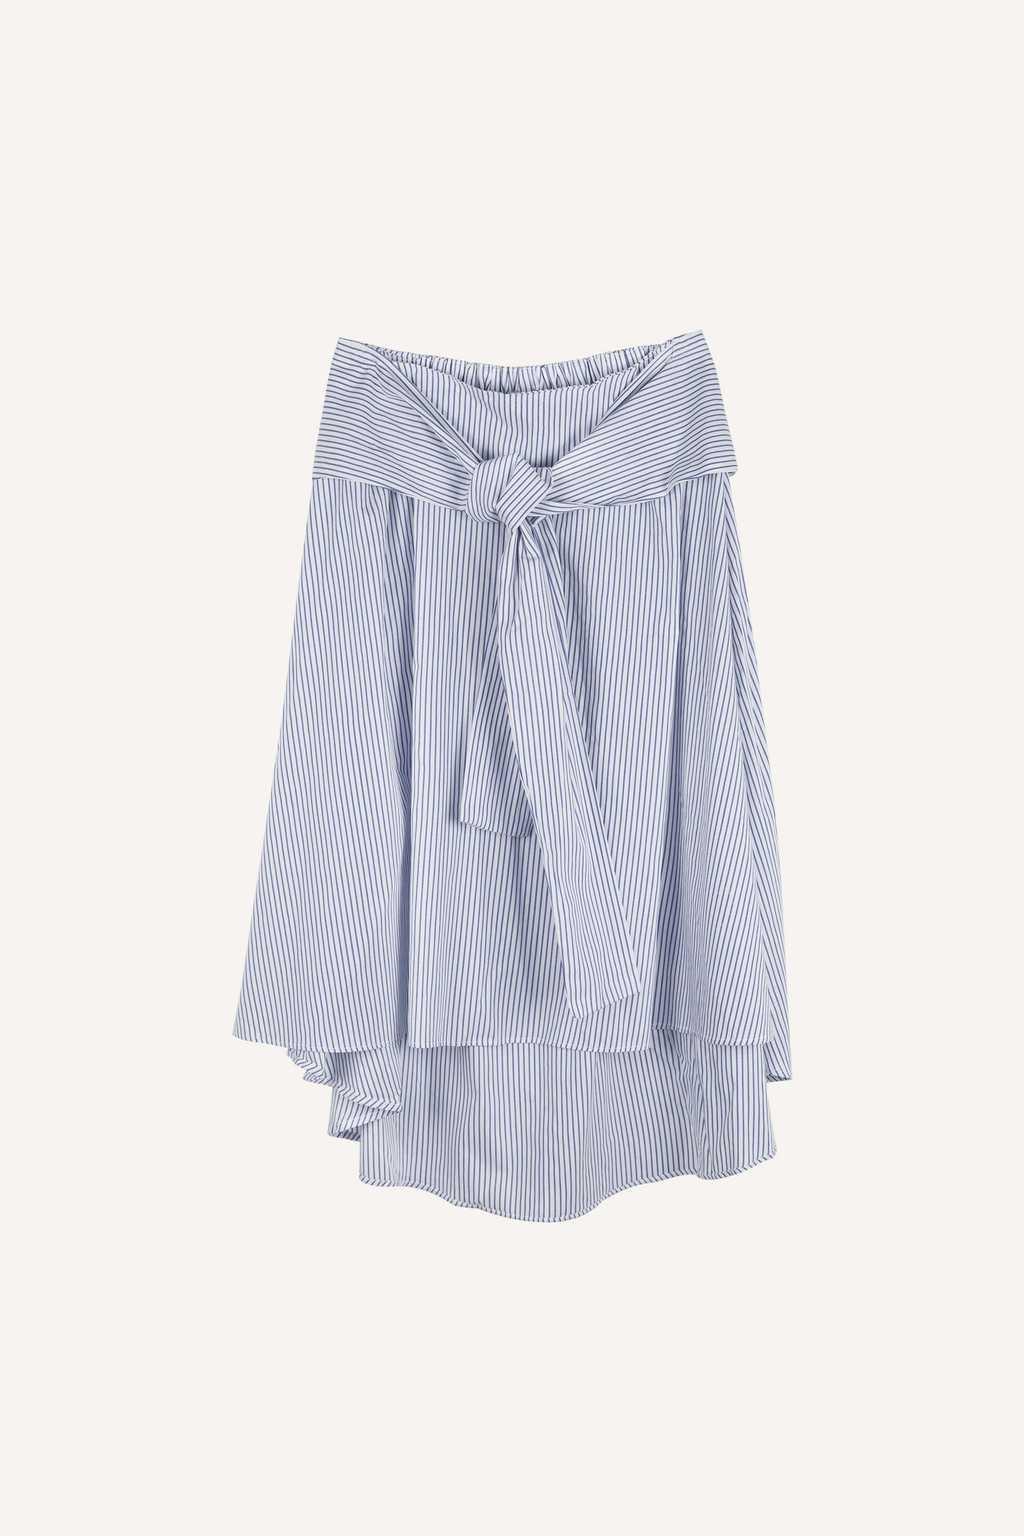 Dress H222 Cream 7